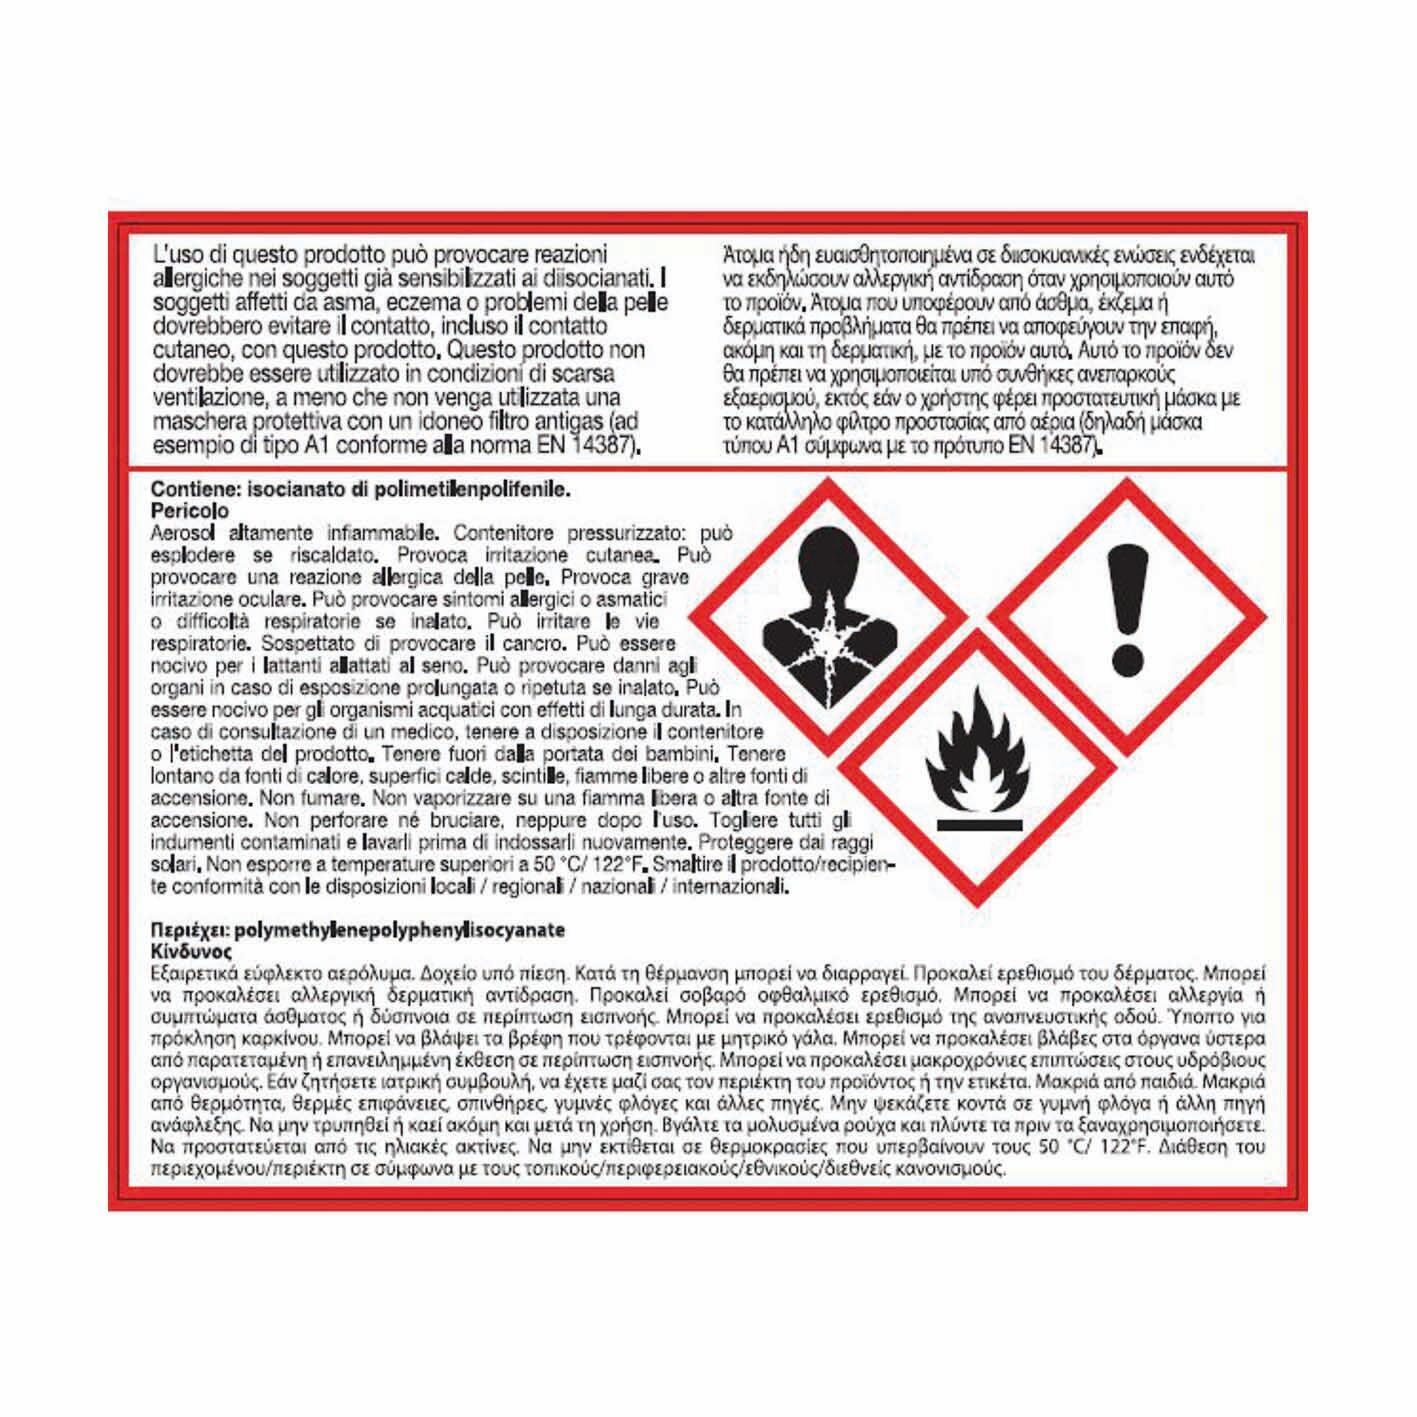 Schiuma espansa poliuretanica bianco per porta 0,75 ml - 4